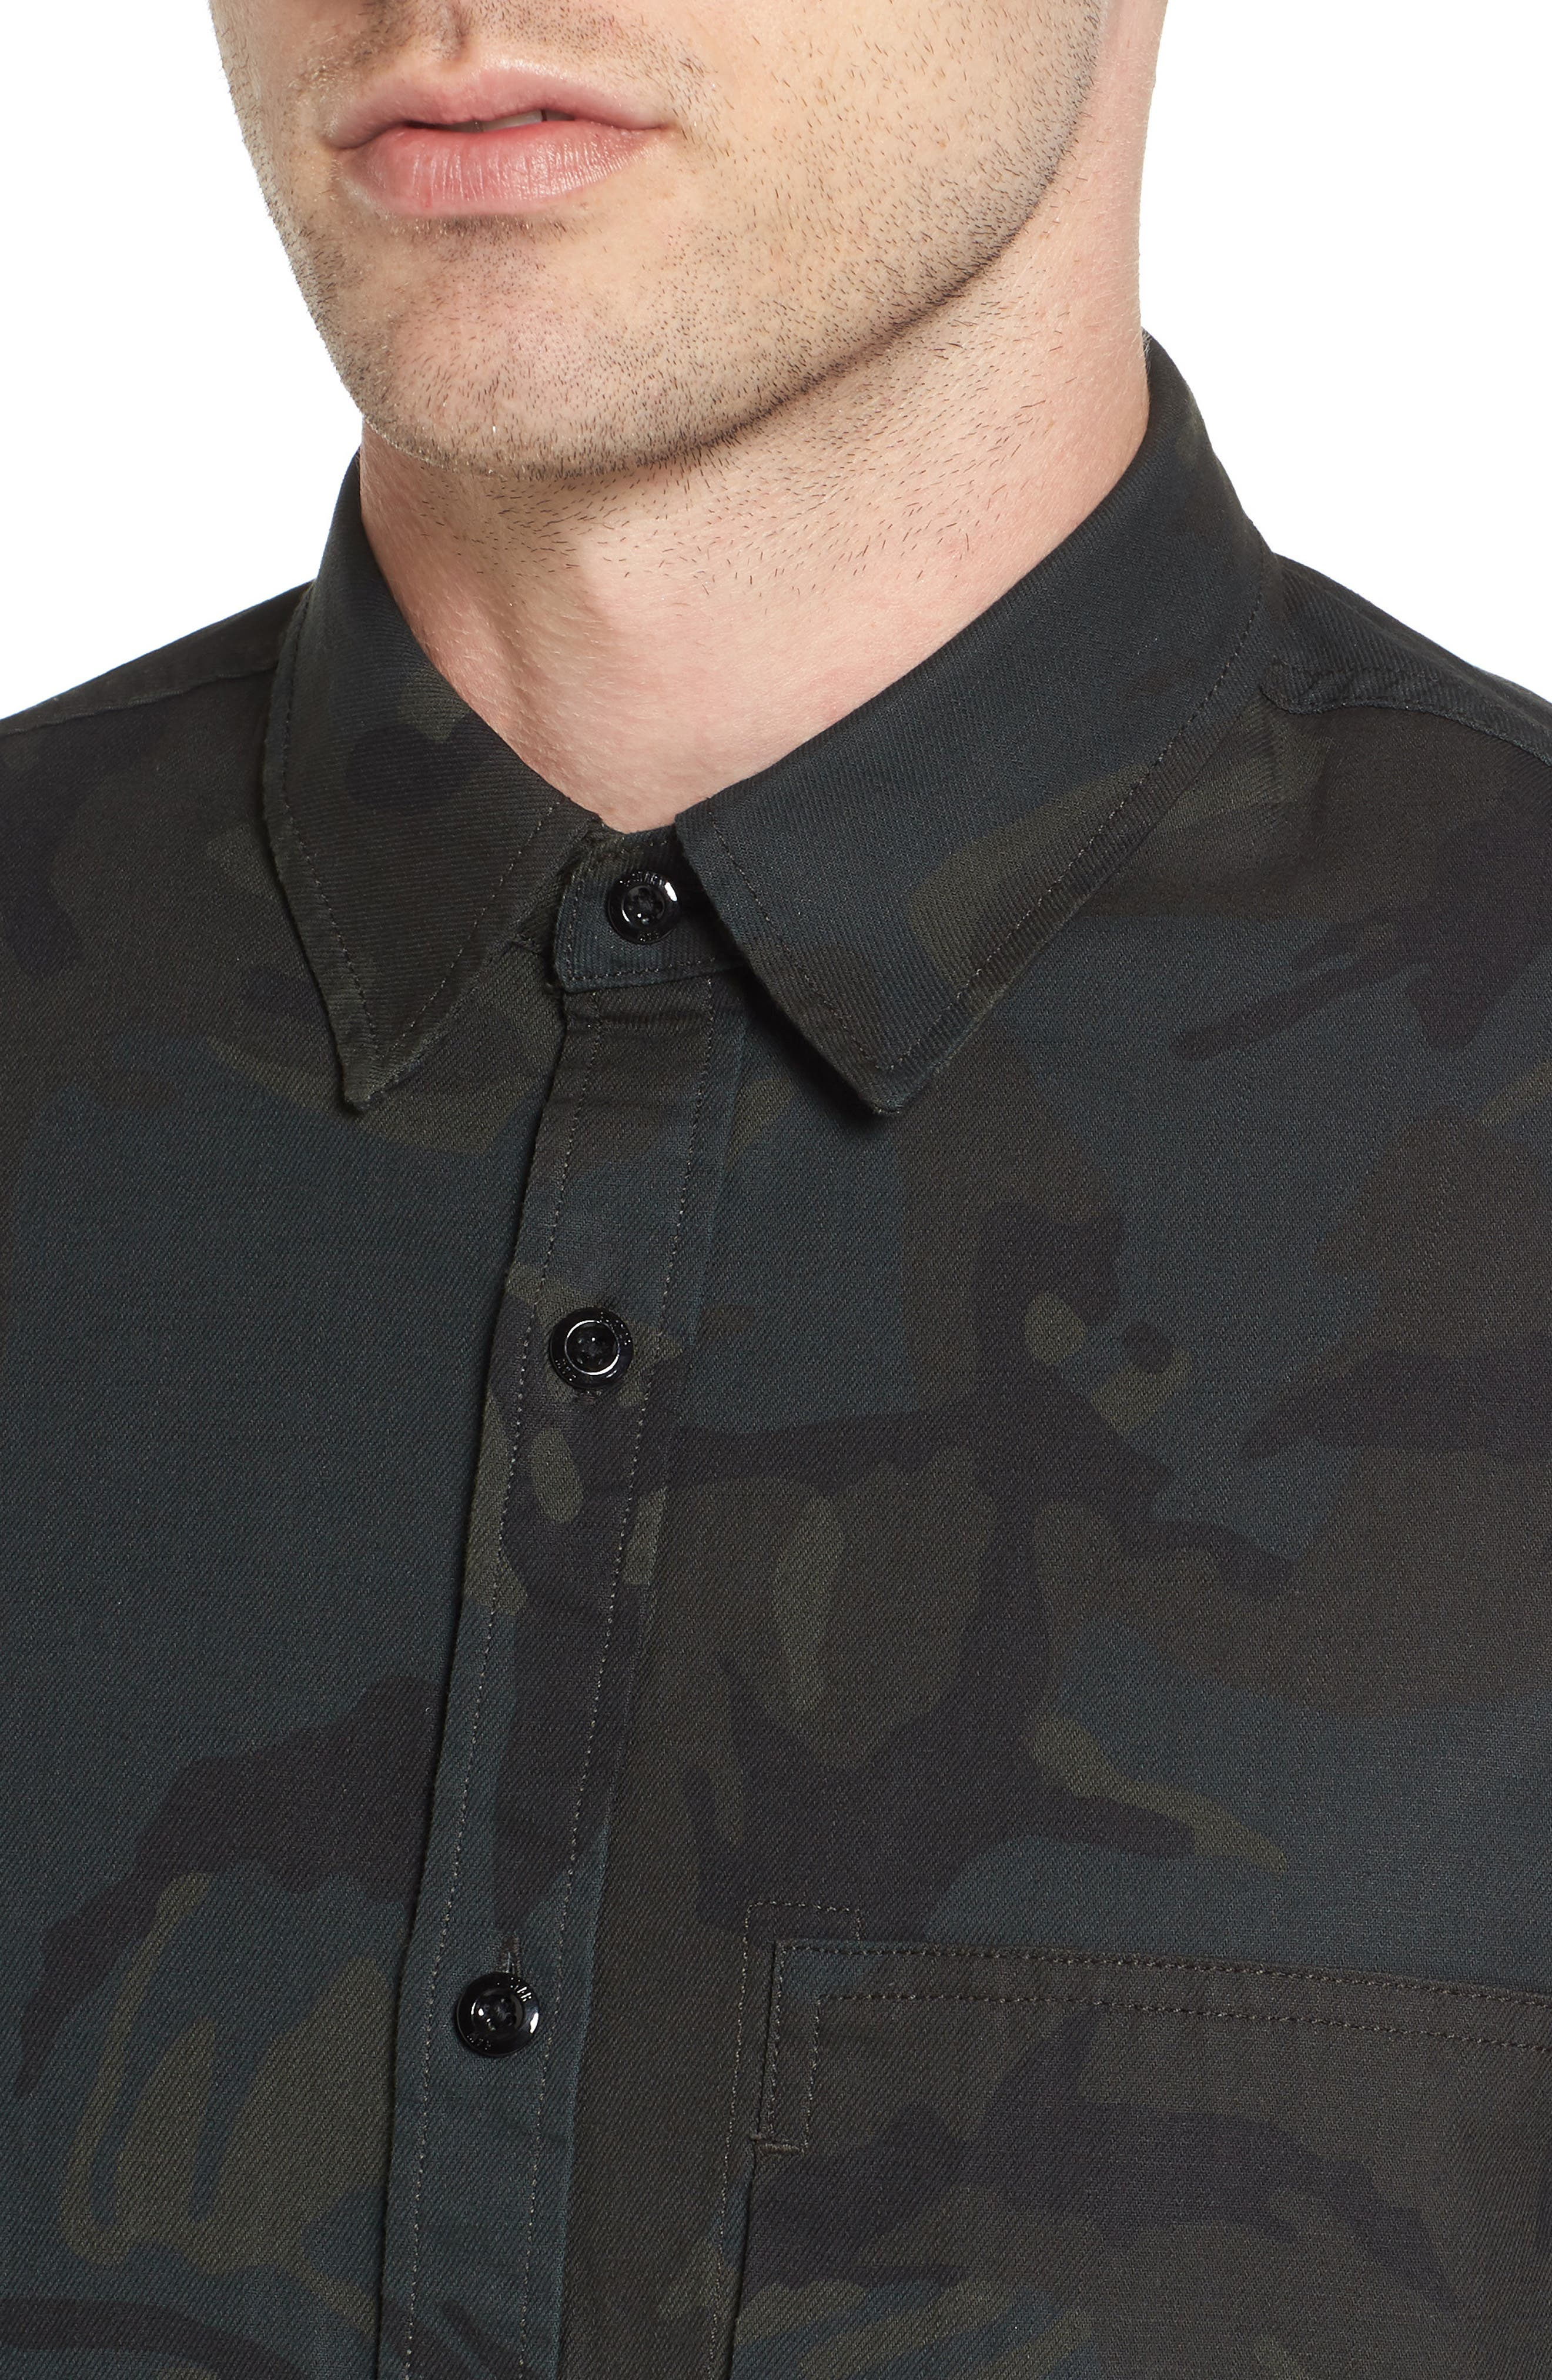 Stalt Long Sleeve Denim Shirt,                             Alternate thumbnail 4, color,                             Asphalt/ Black